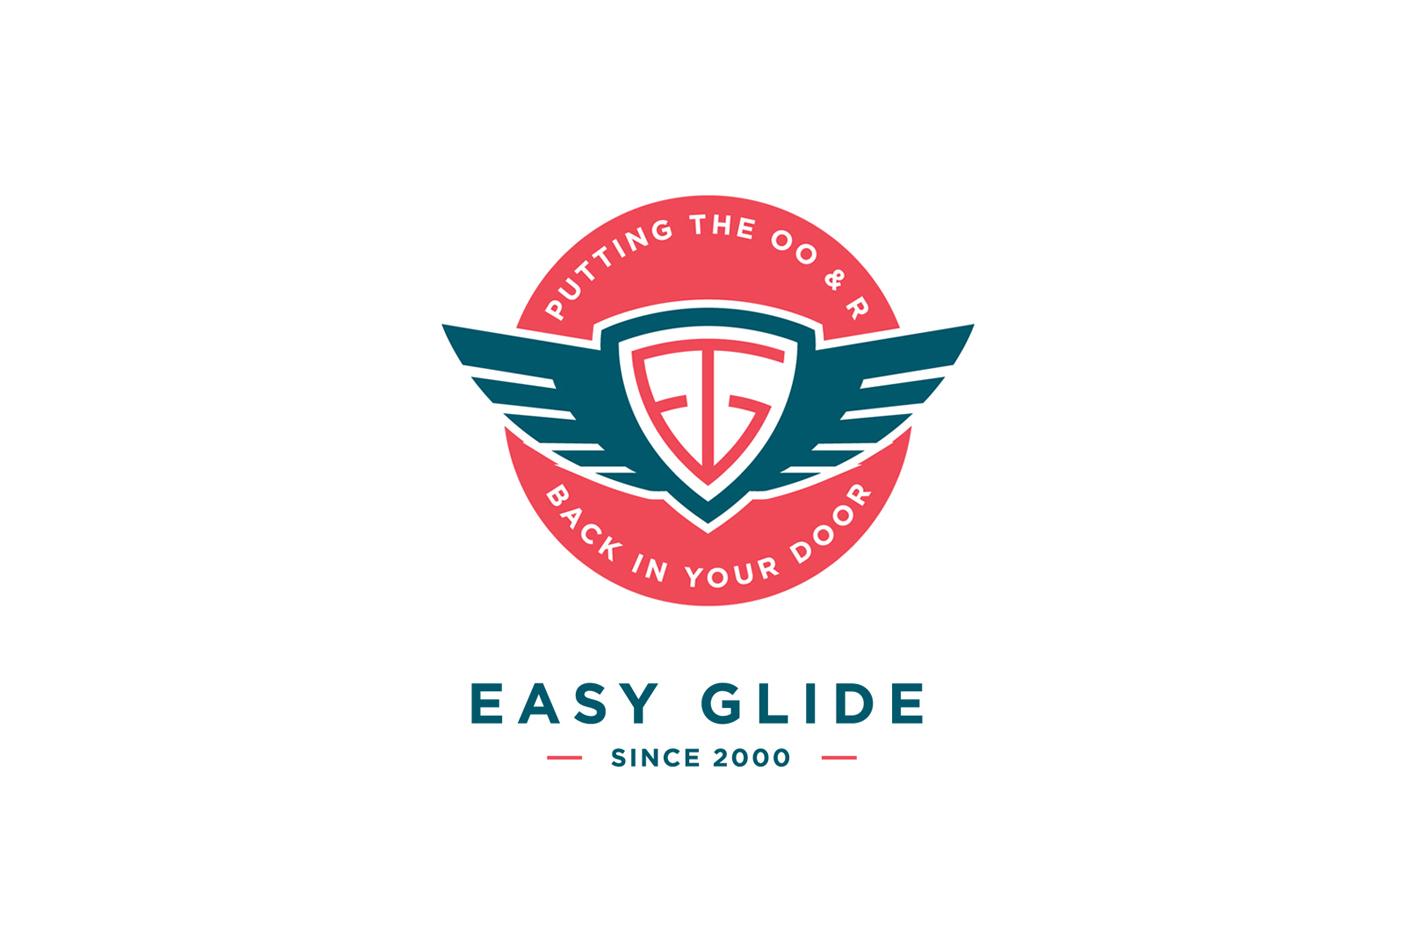 Easy Glide Australia Branding design for a door refurbishment company based in Sydney, Australia.